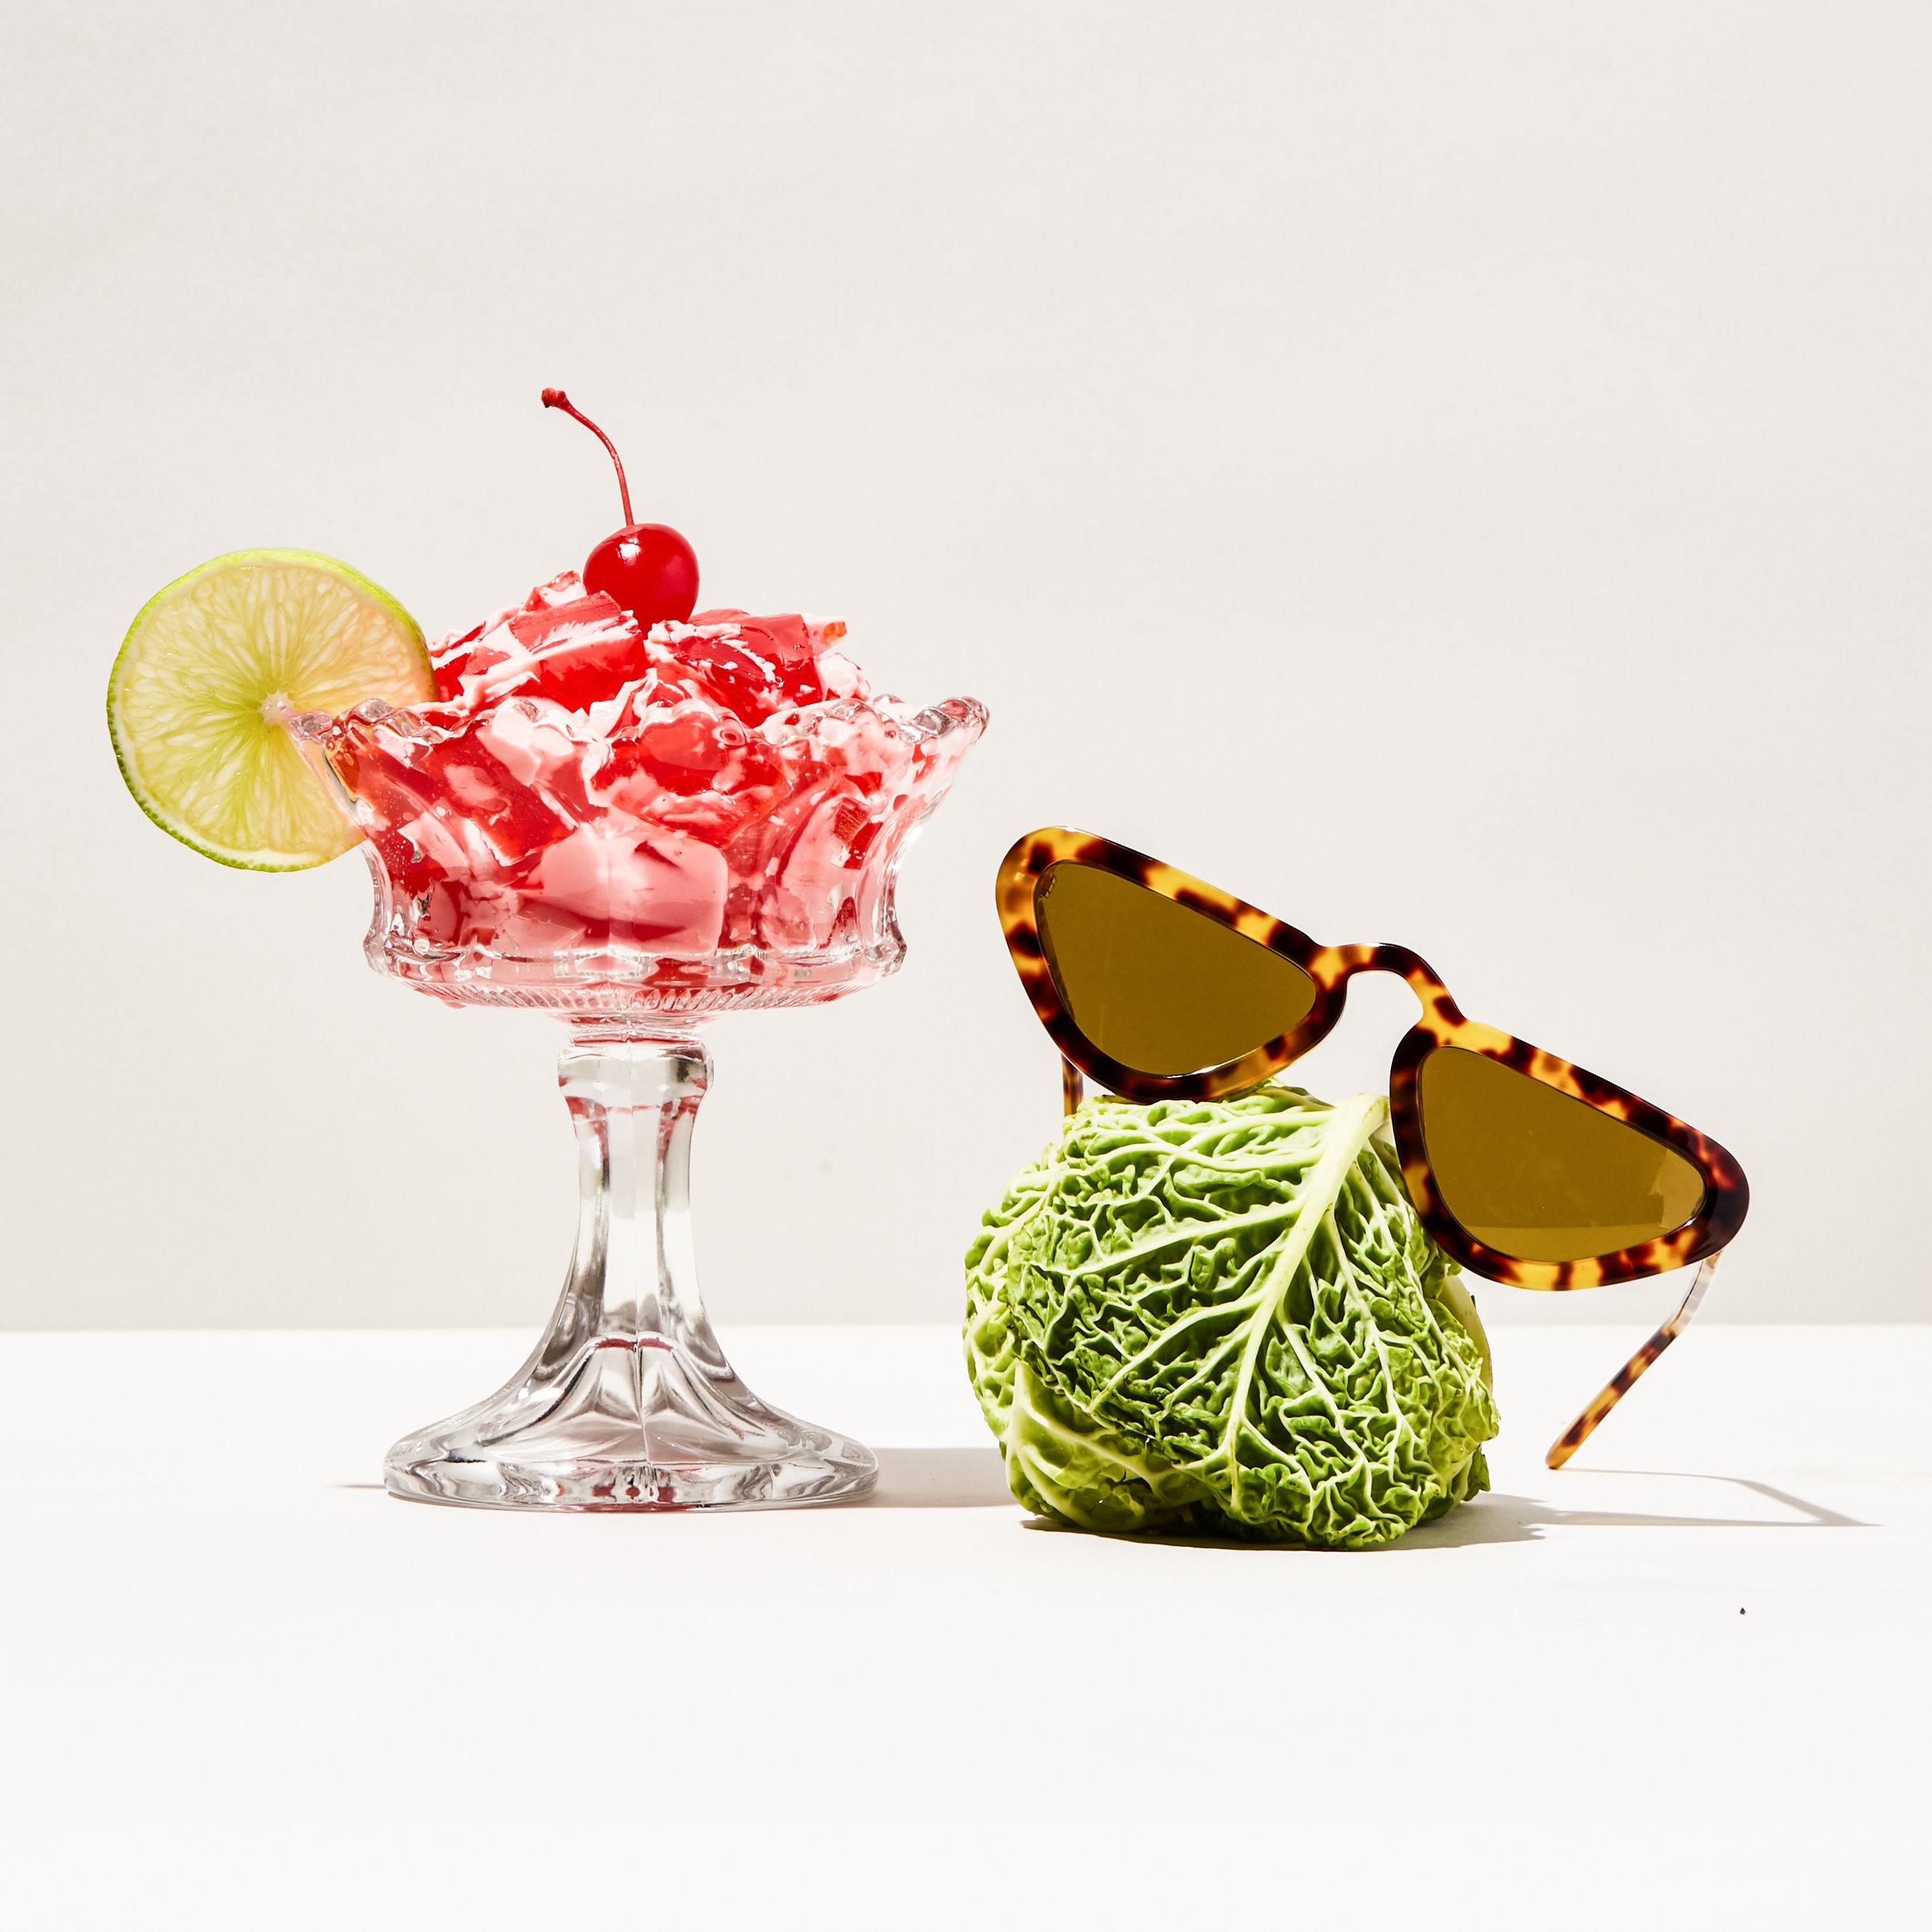 Ecomm_StillLife_Sunglasses_toirtose.jpg